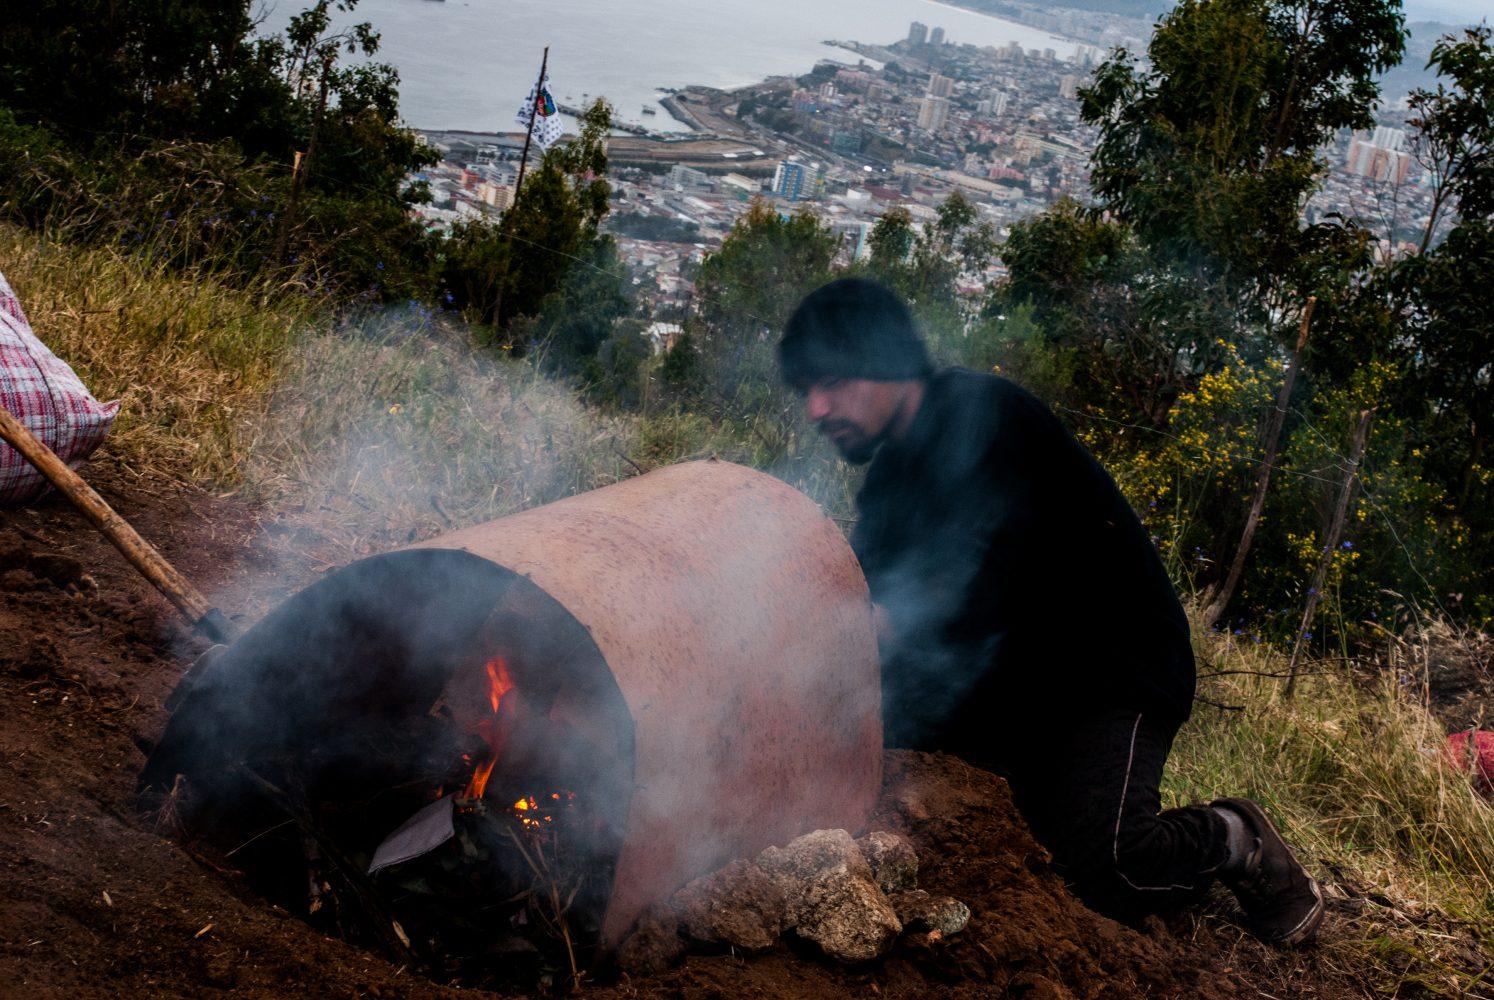 Toma Violeta Parra - Valparaiso - HC - 02